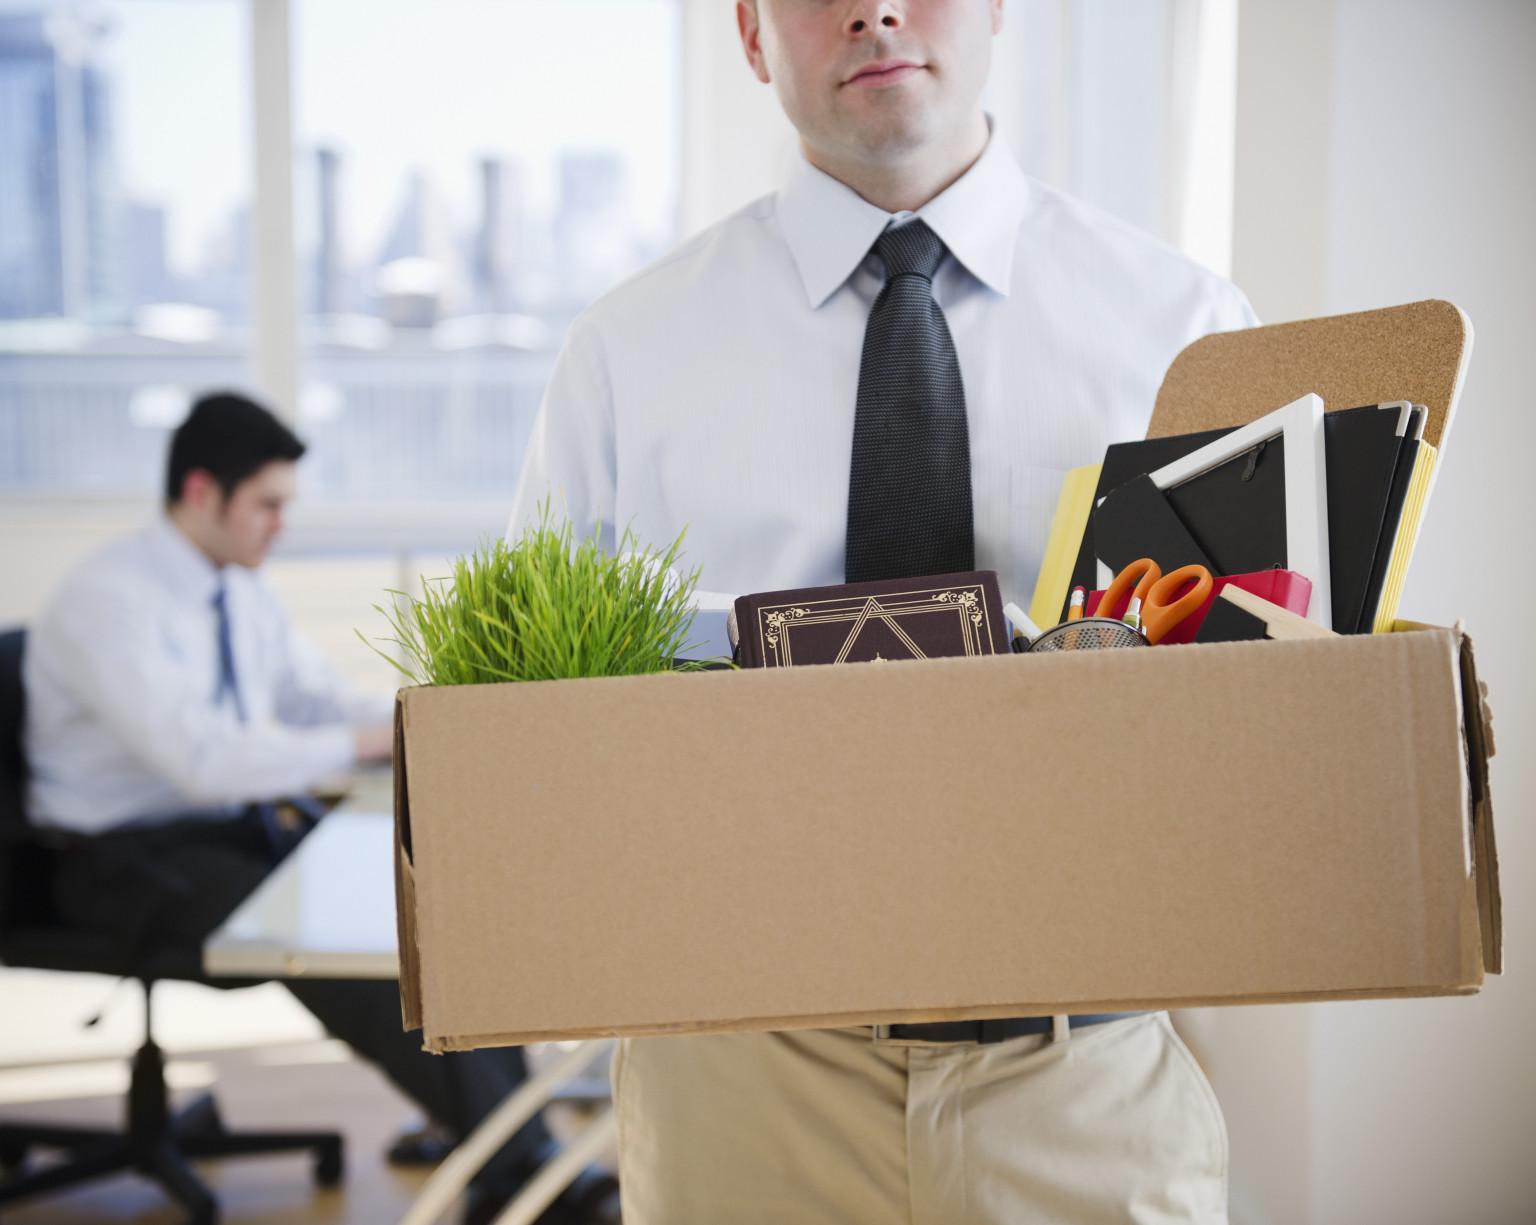 Fired Caucasian businessman carrying personal belongings